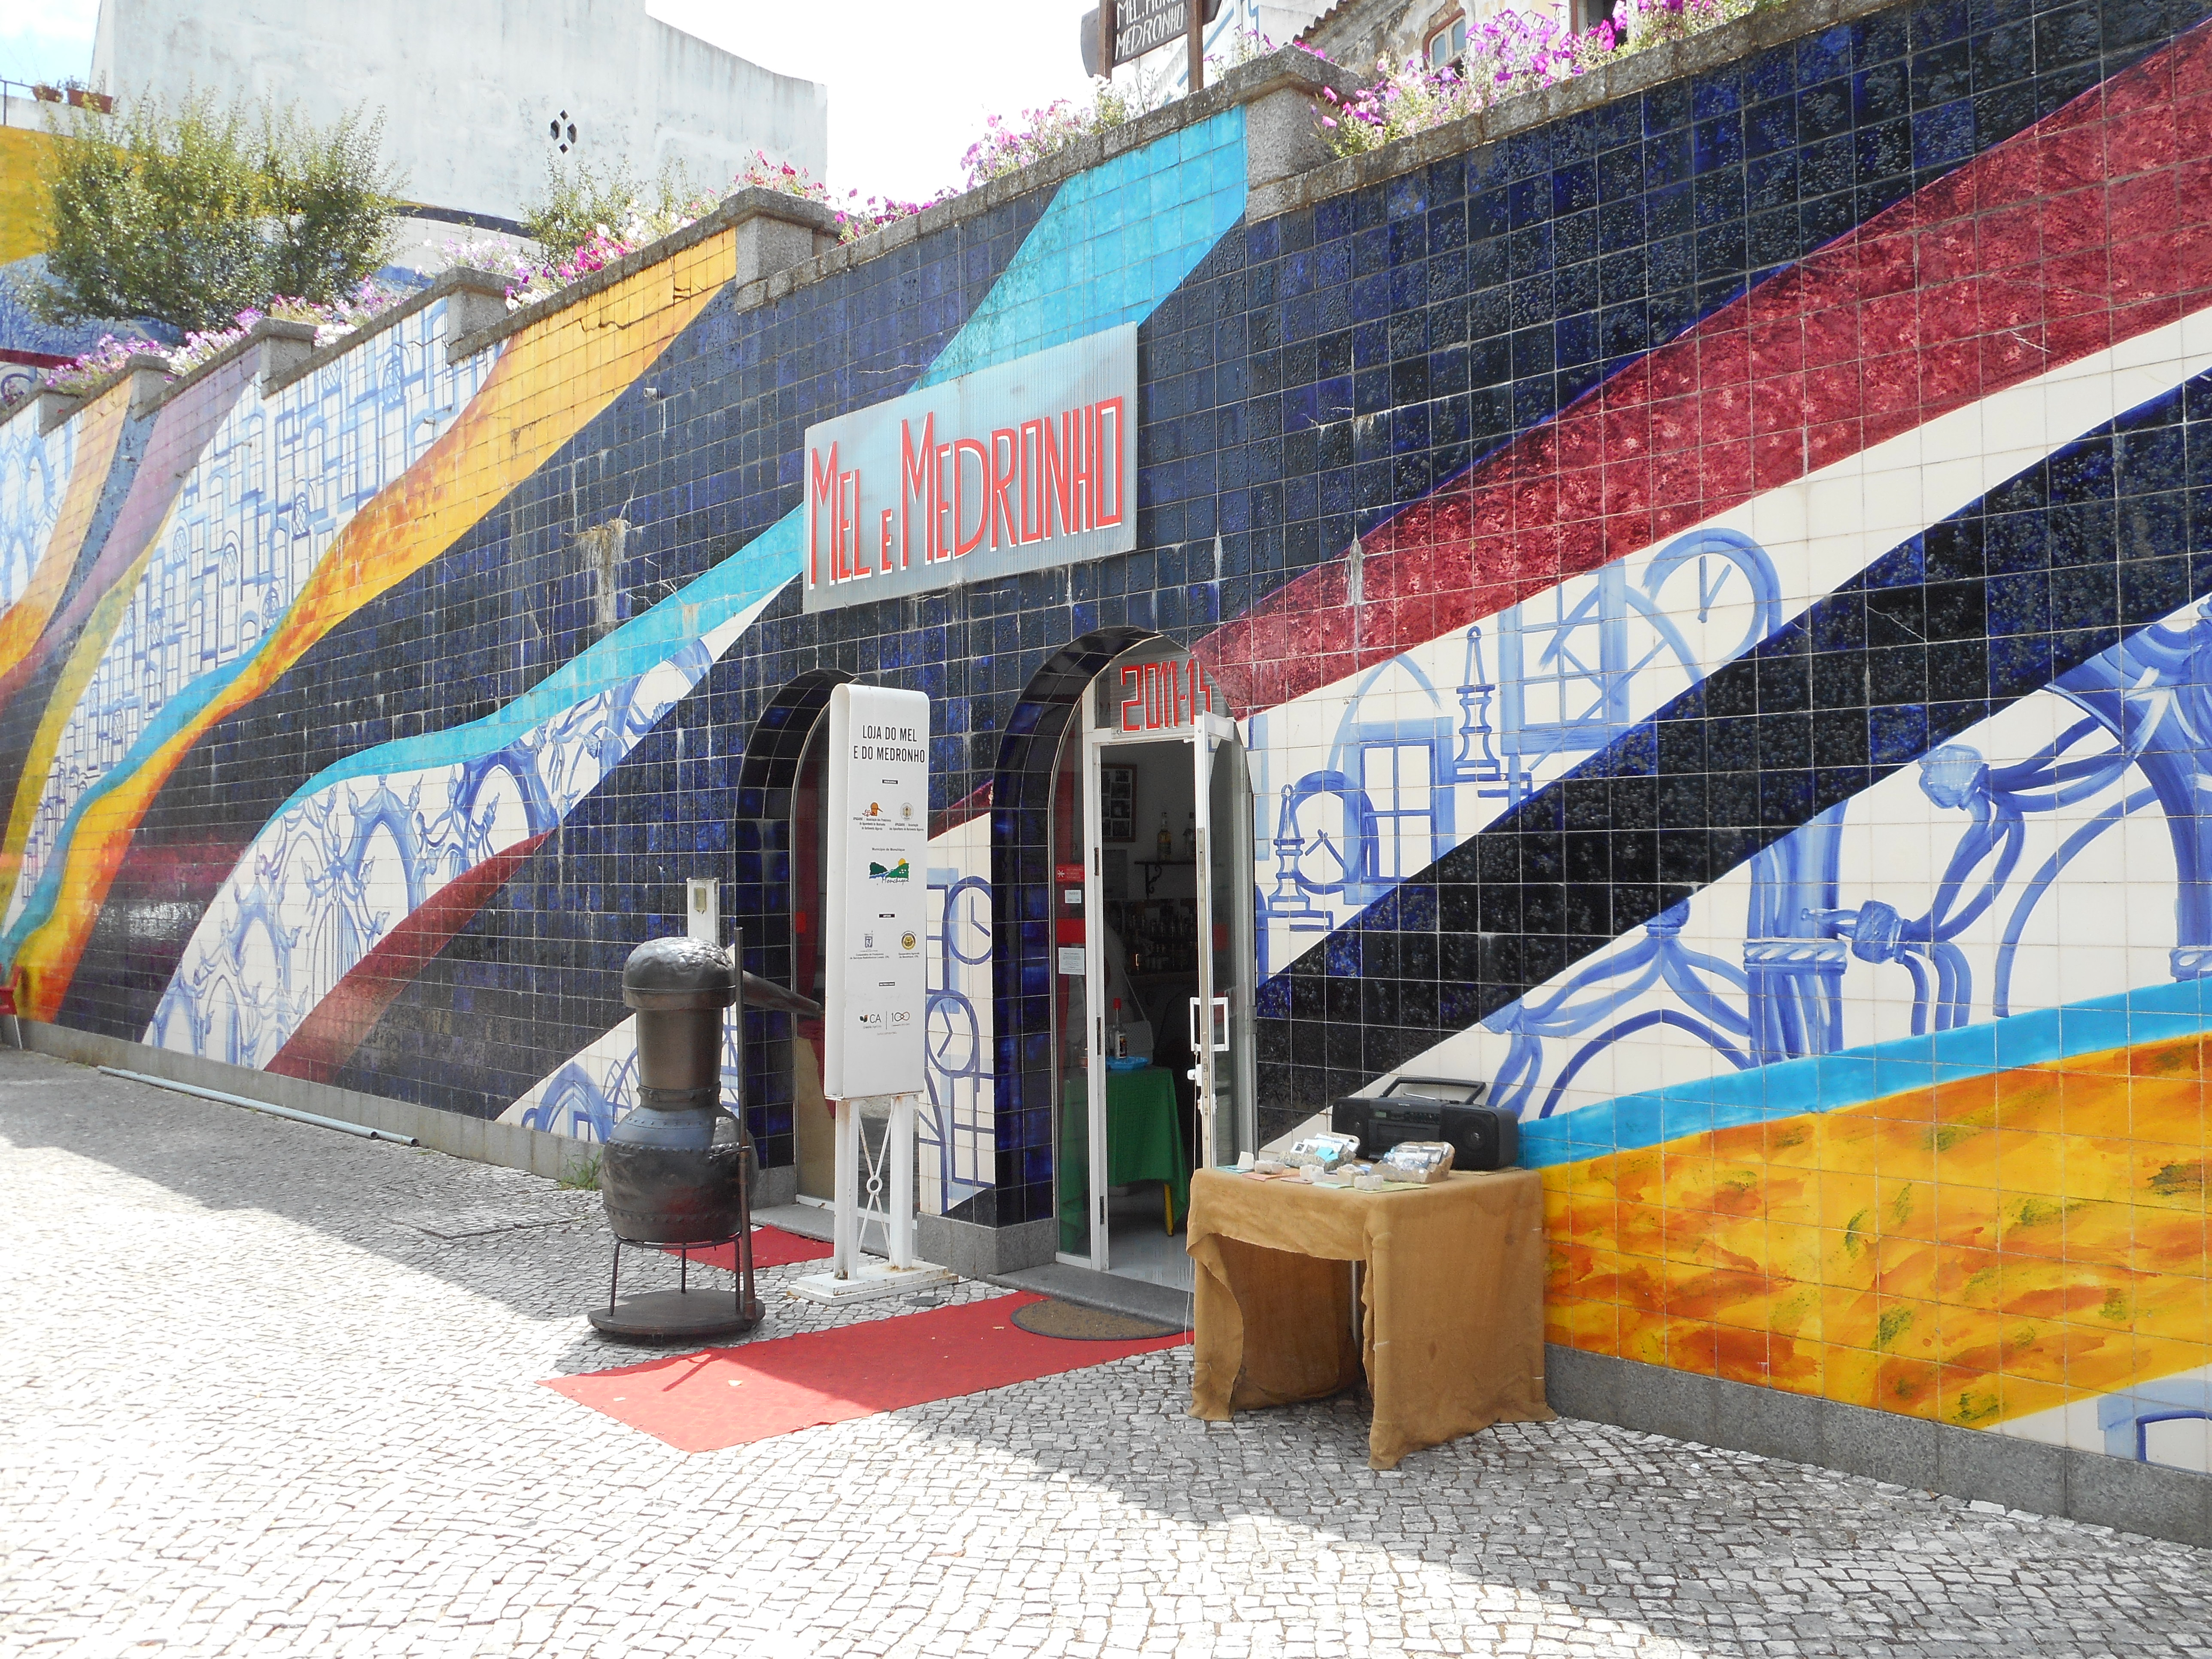 Aquardente Medronho Shop Monchique August